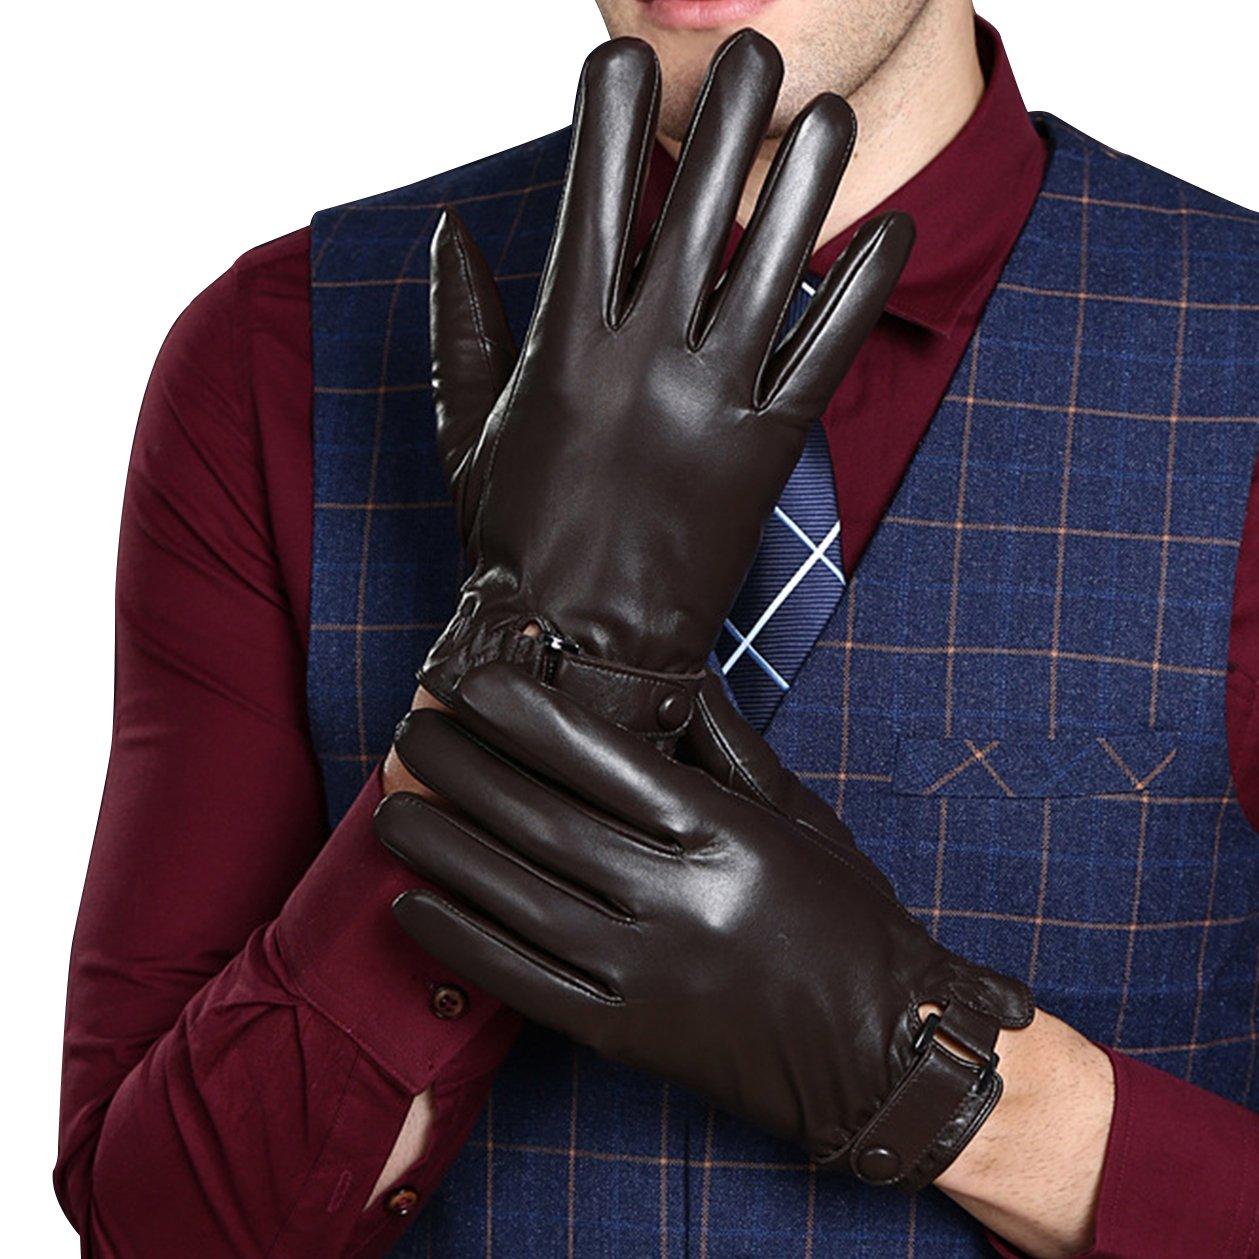 KelaSip Sheepskin Leather Gloves Touchscreen Winter Warm Business Fashion for Men's Texting Driving